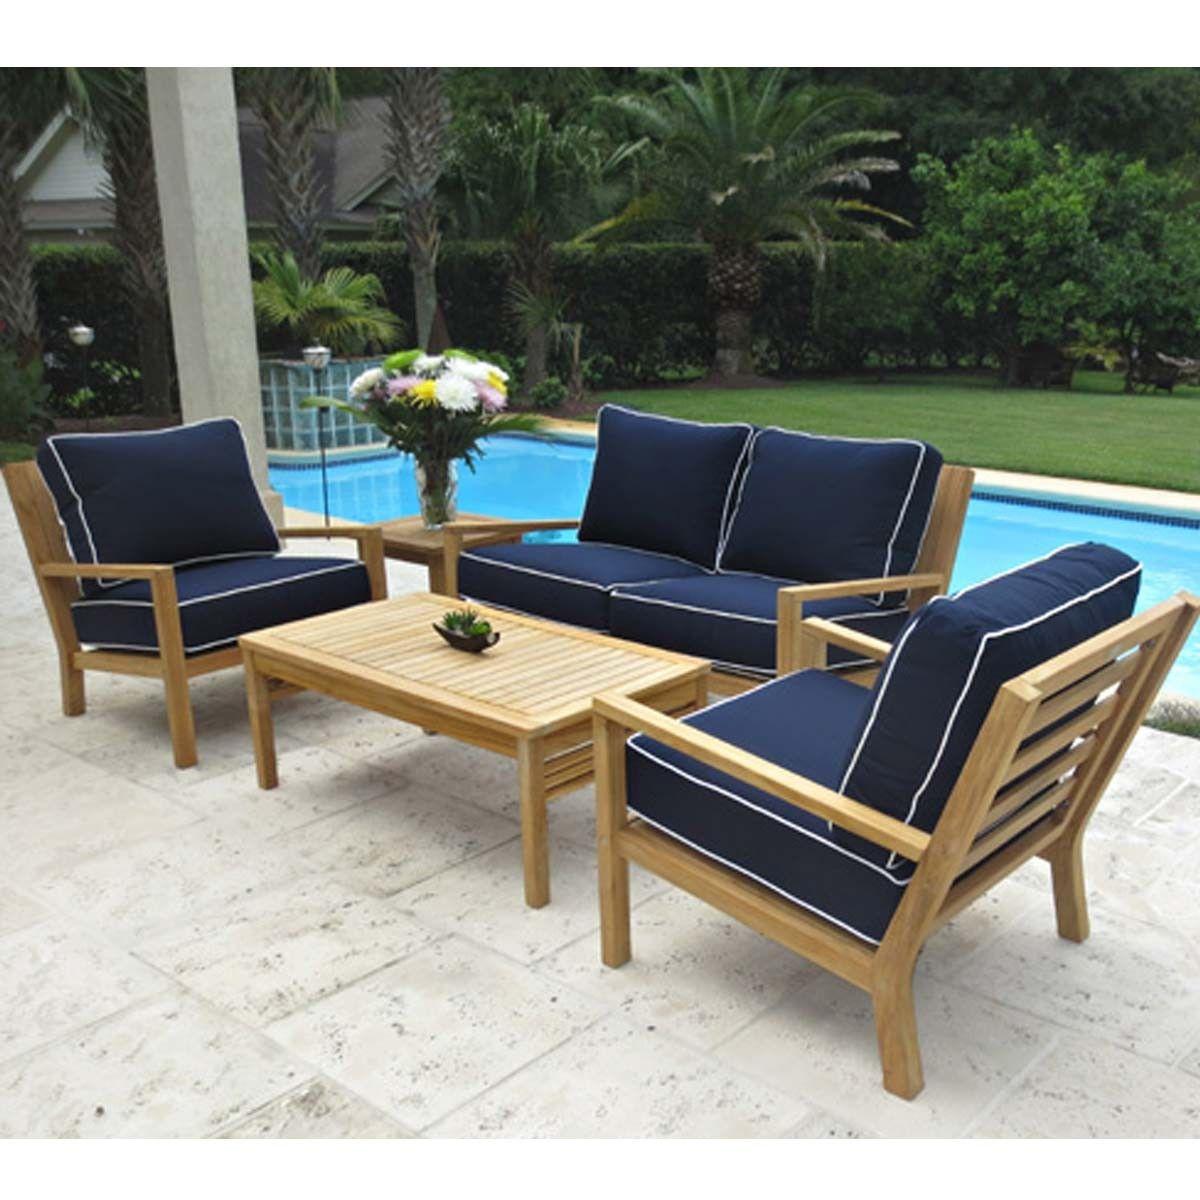 Coastal Patio Furniture Set